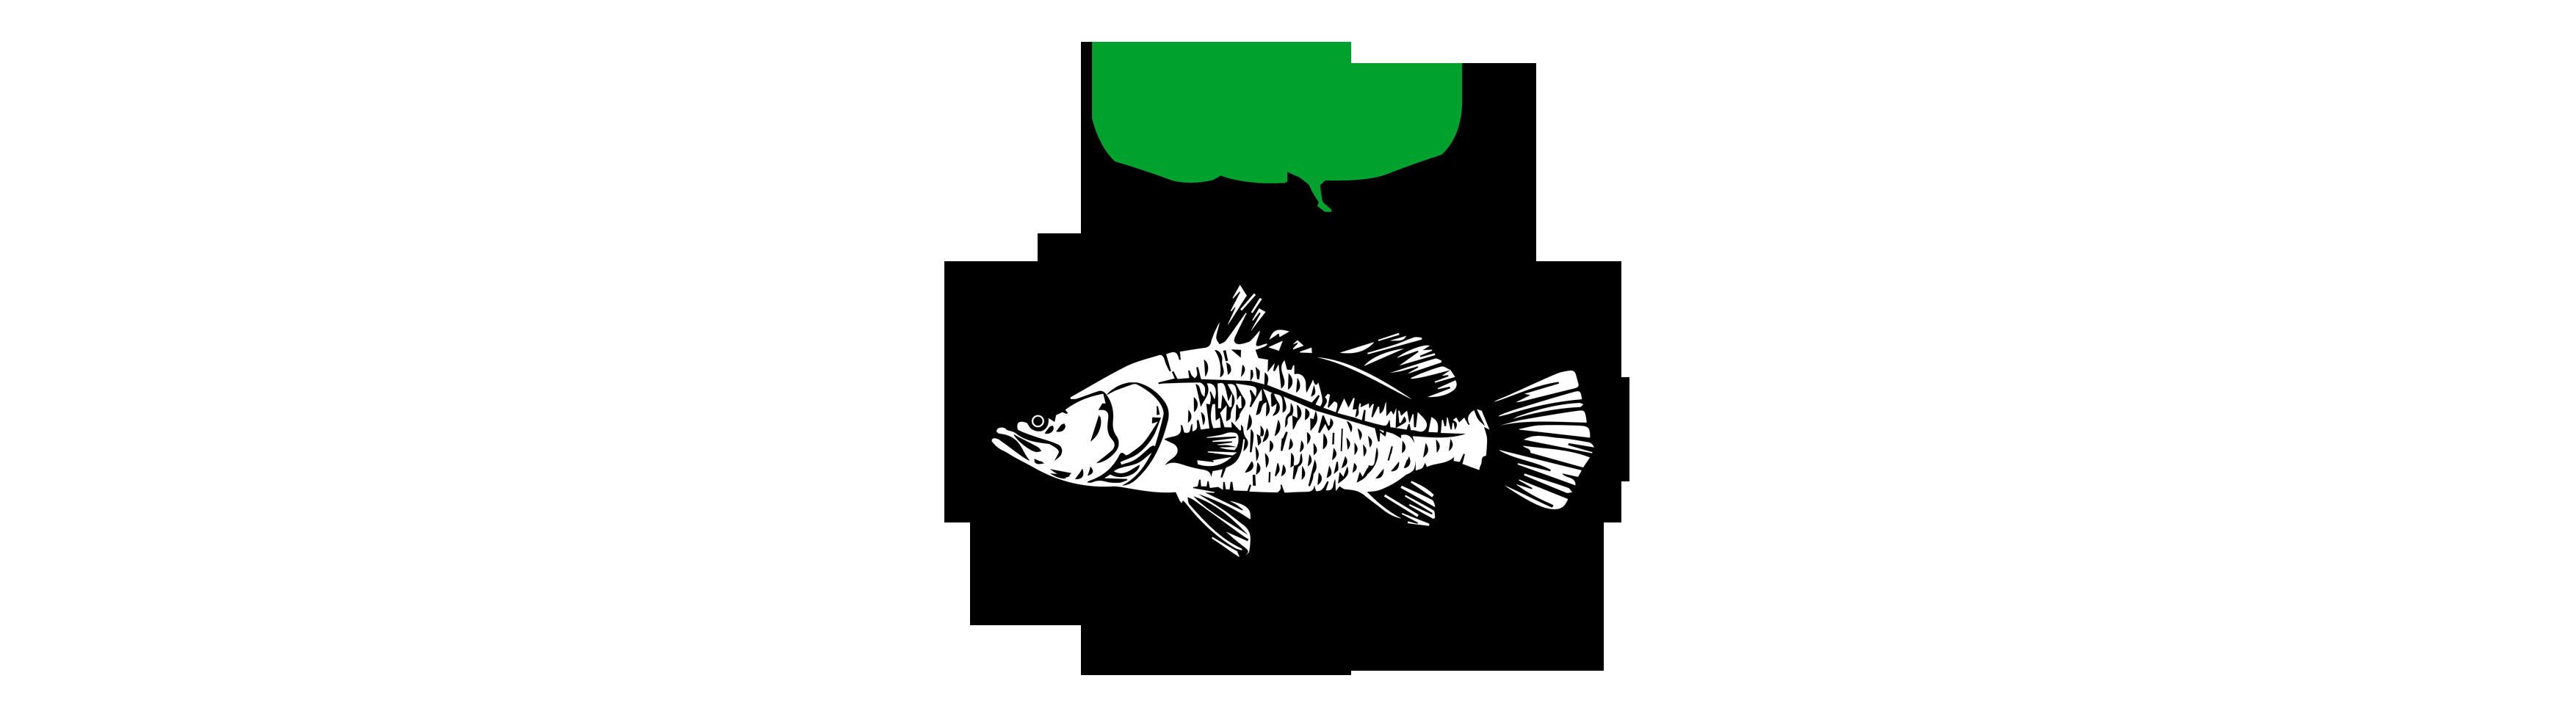 Clipart stinky fish image royalty free library River Stone Fish Farm - Sustainable Australian Barramundi image royalty free library